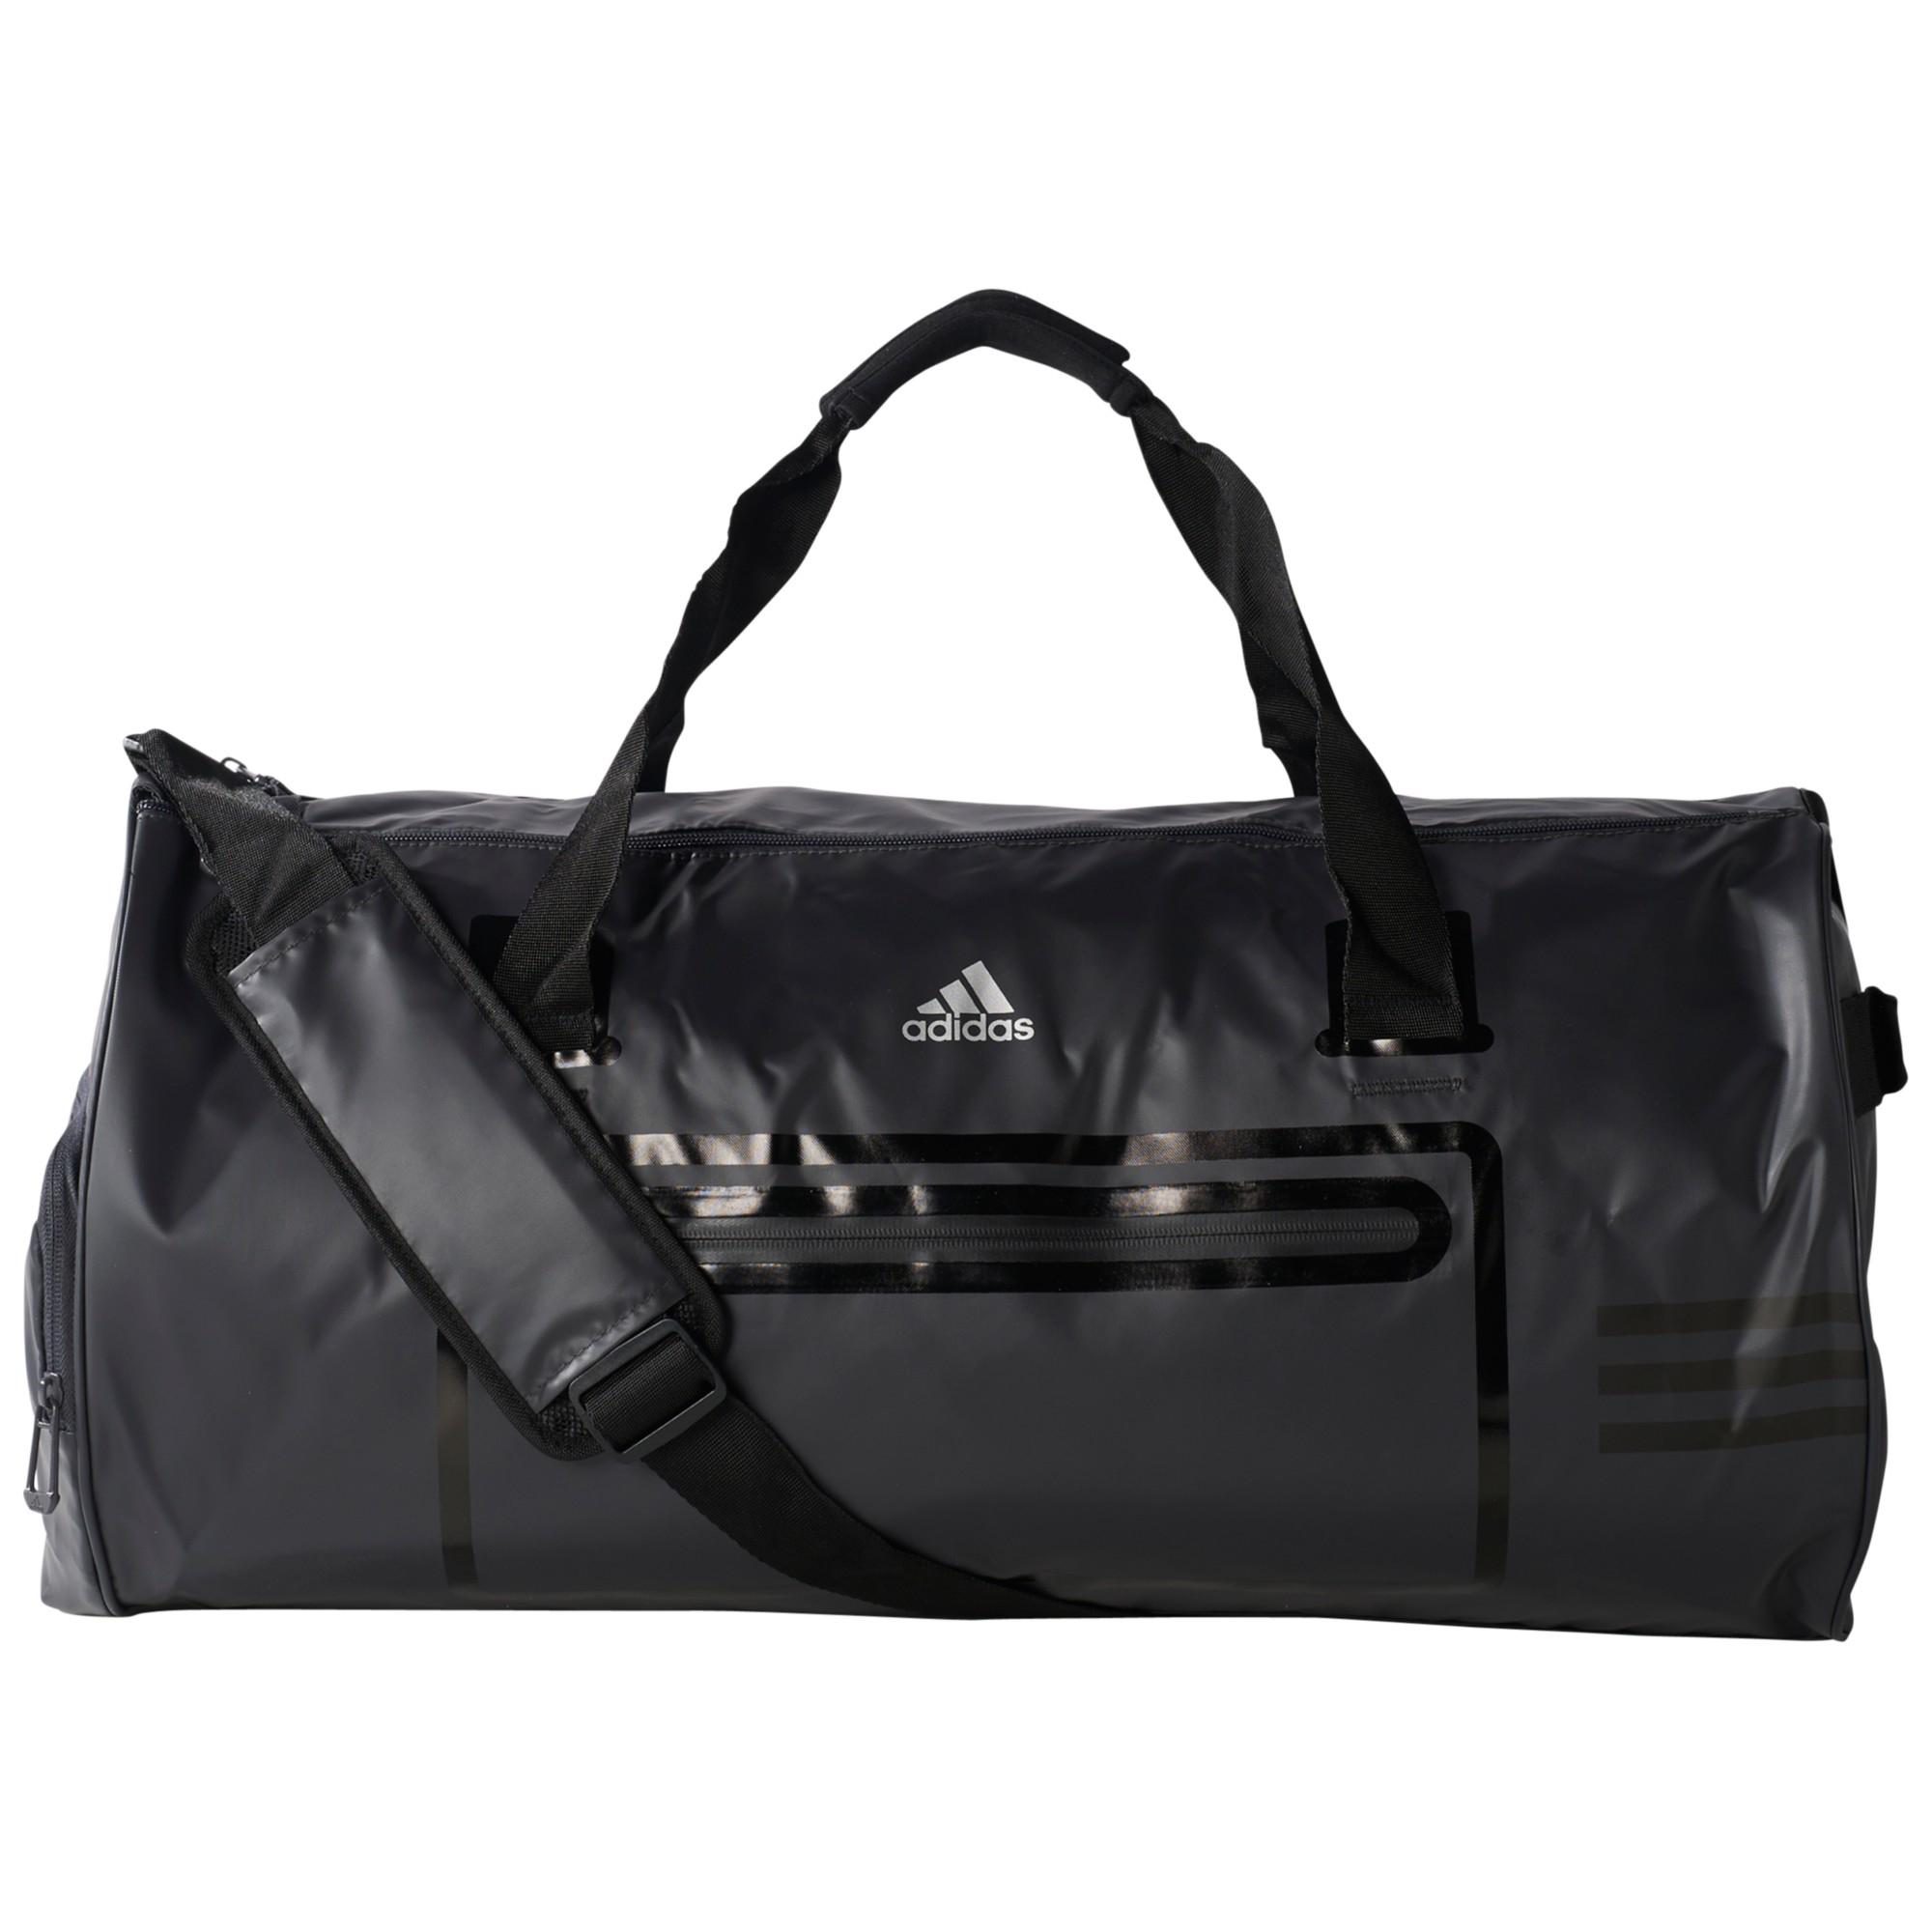 6767691bb9 adidas Originals Climacool Team Bag in Black for Men - Lyst